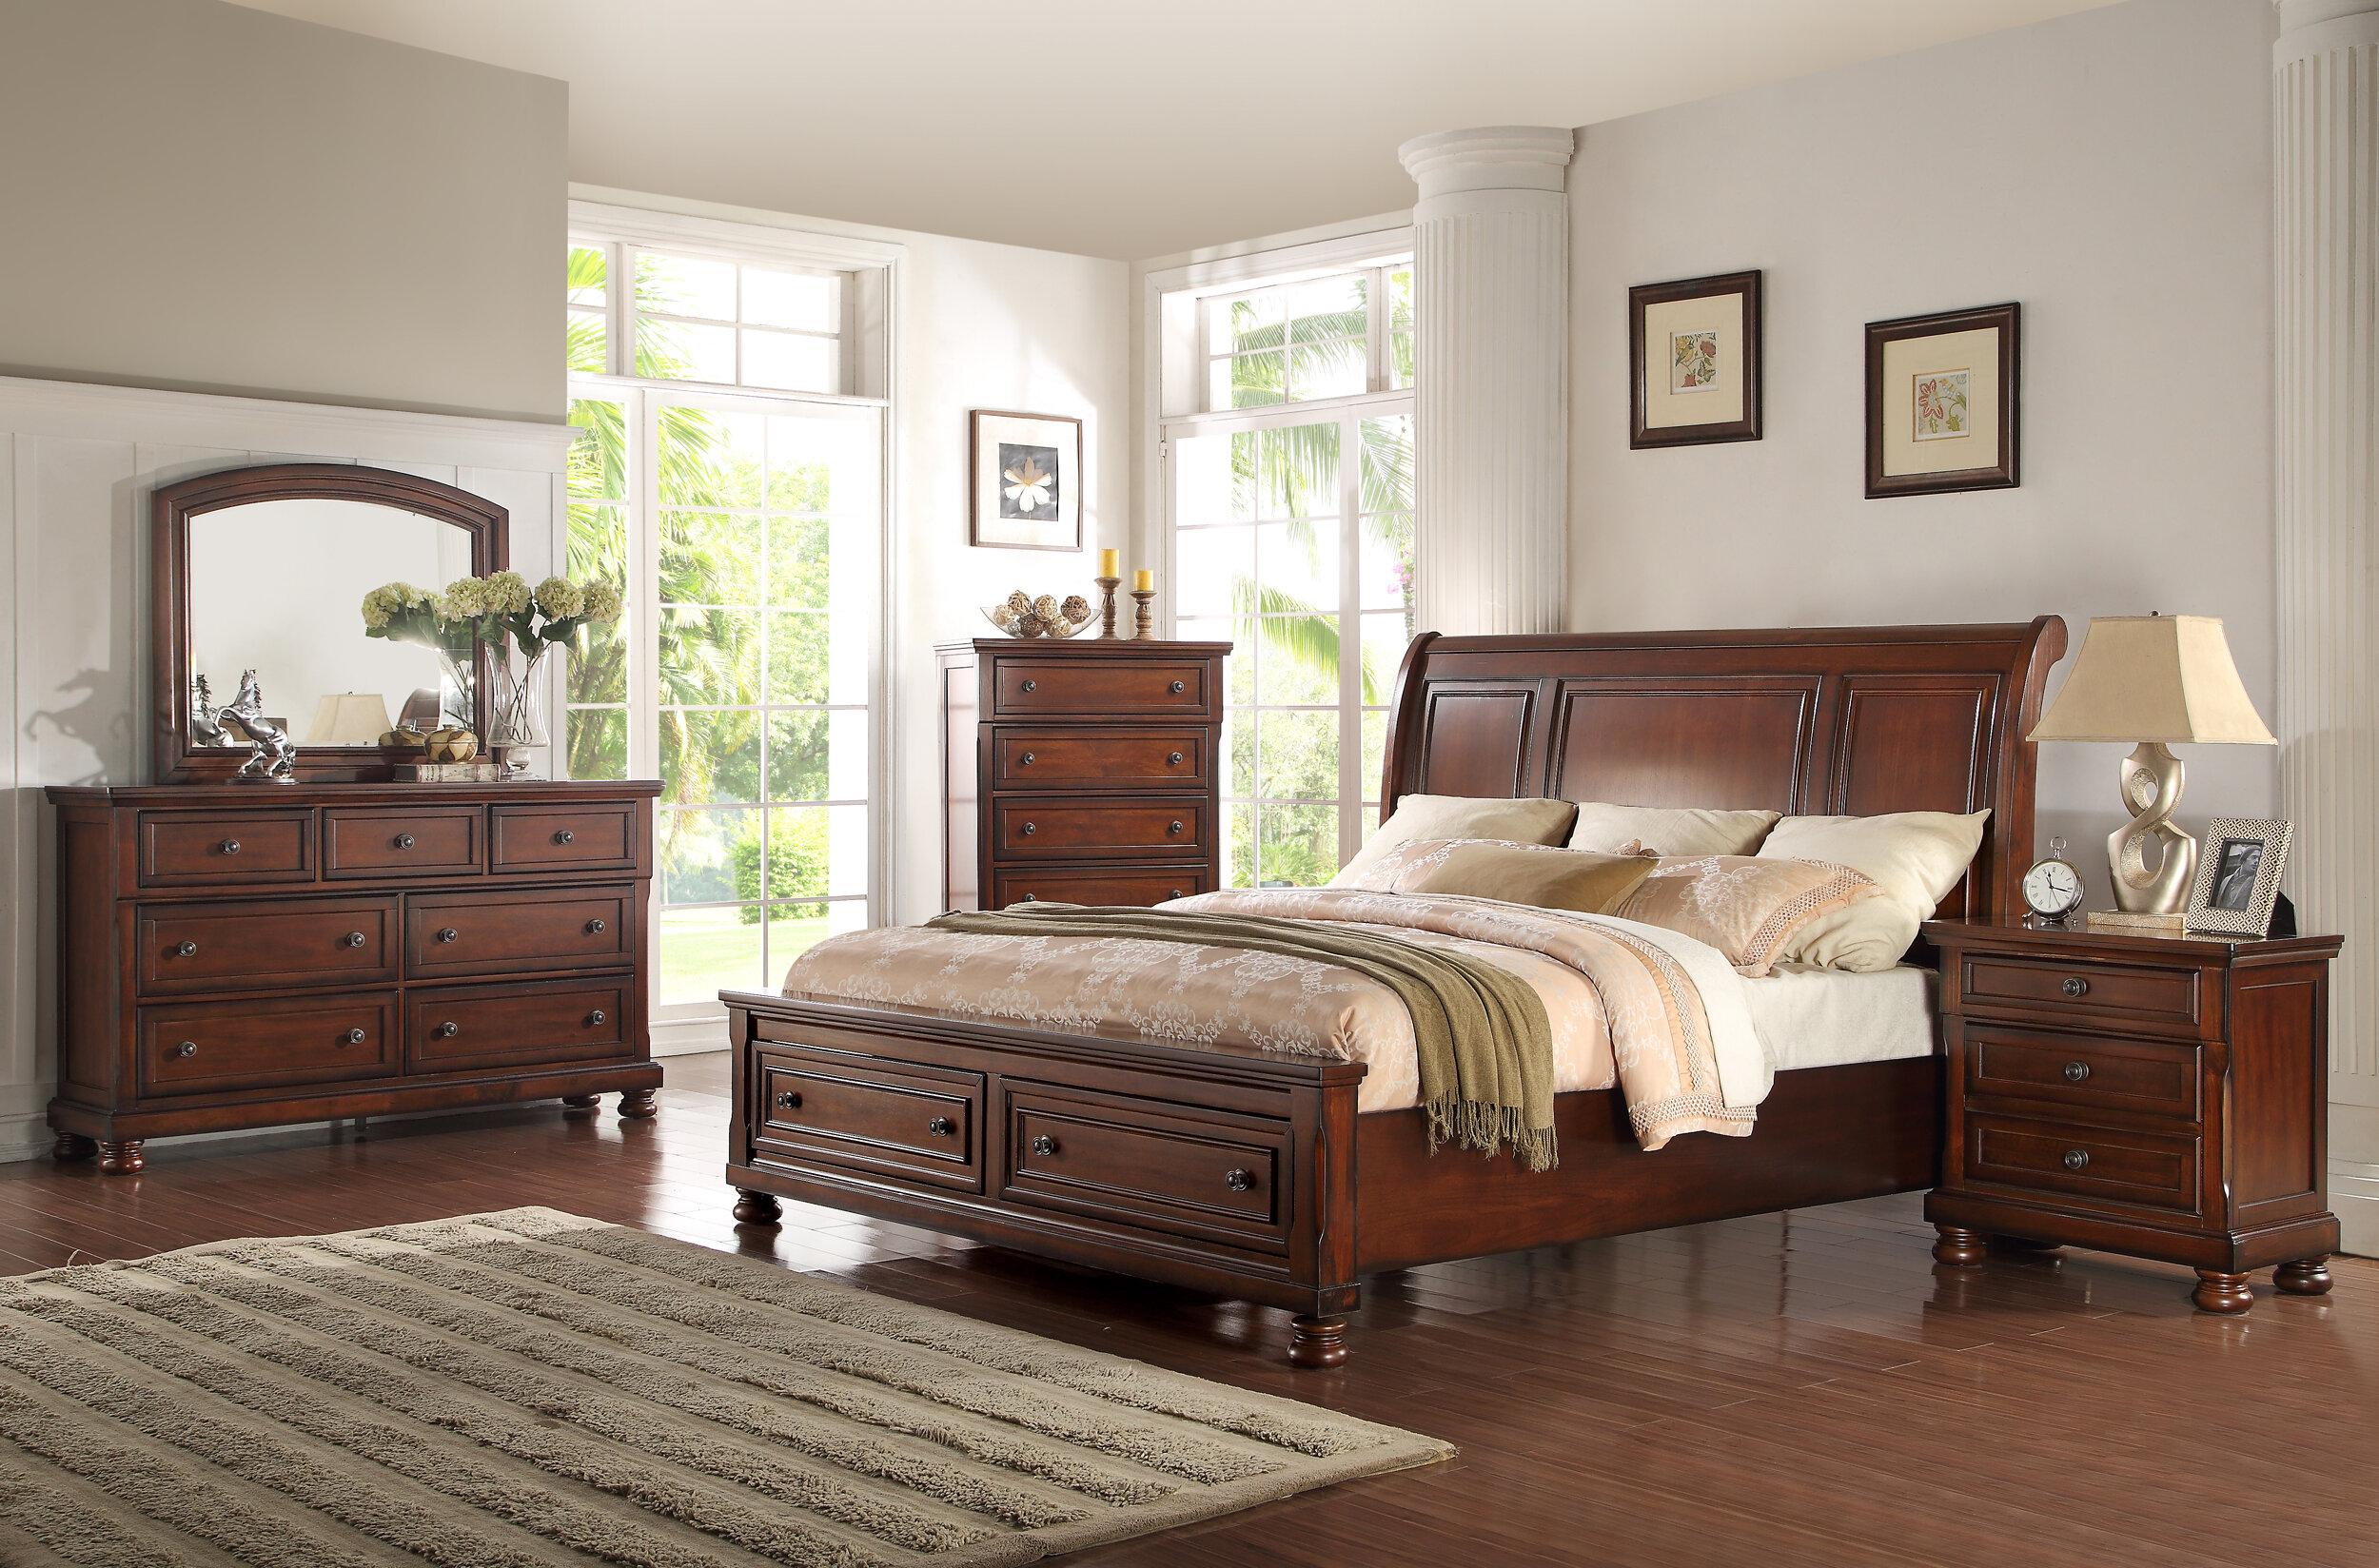 Darby Home Co Vitela Queen Standard Solid Wood 4 Piece Bedroom Set Reviews Wayfair